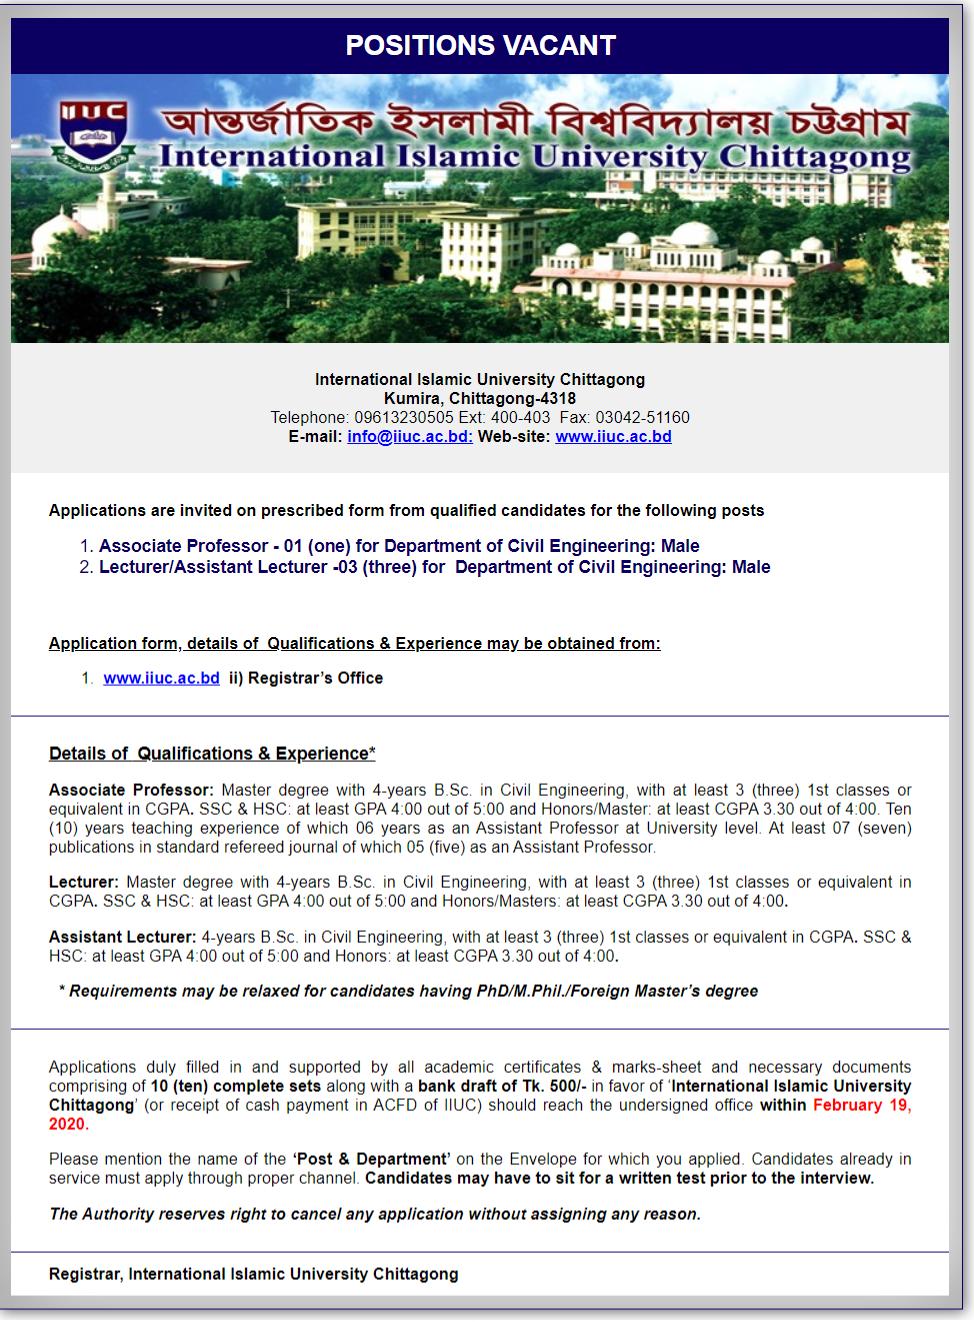 International Islamic University Chittagong Job Circular 2020